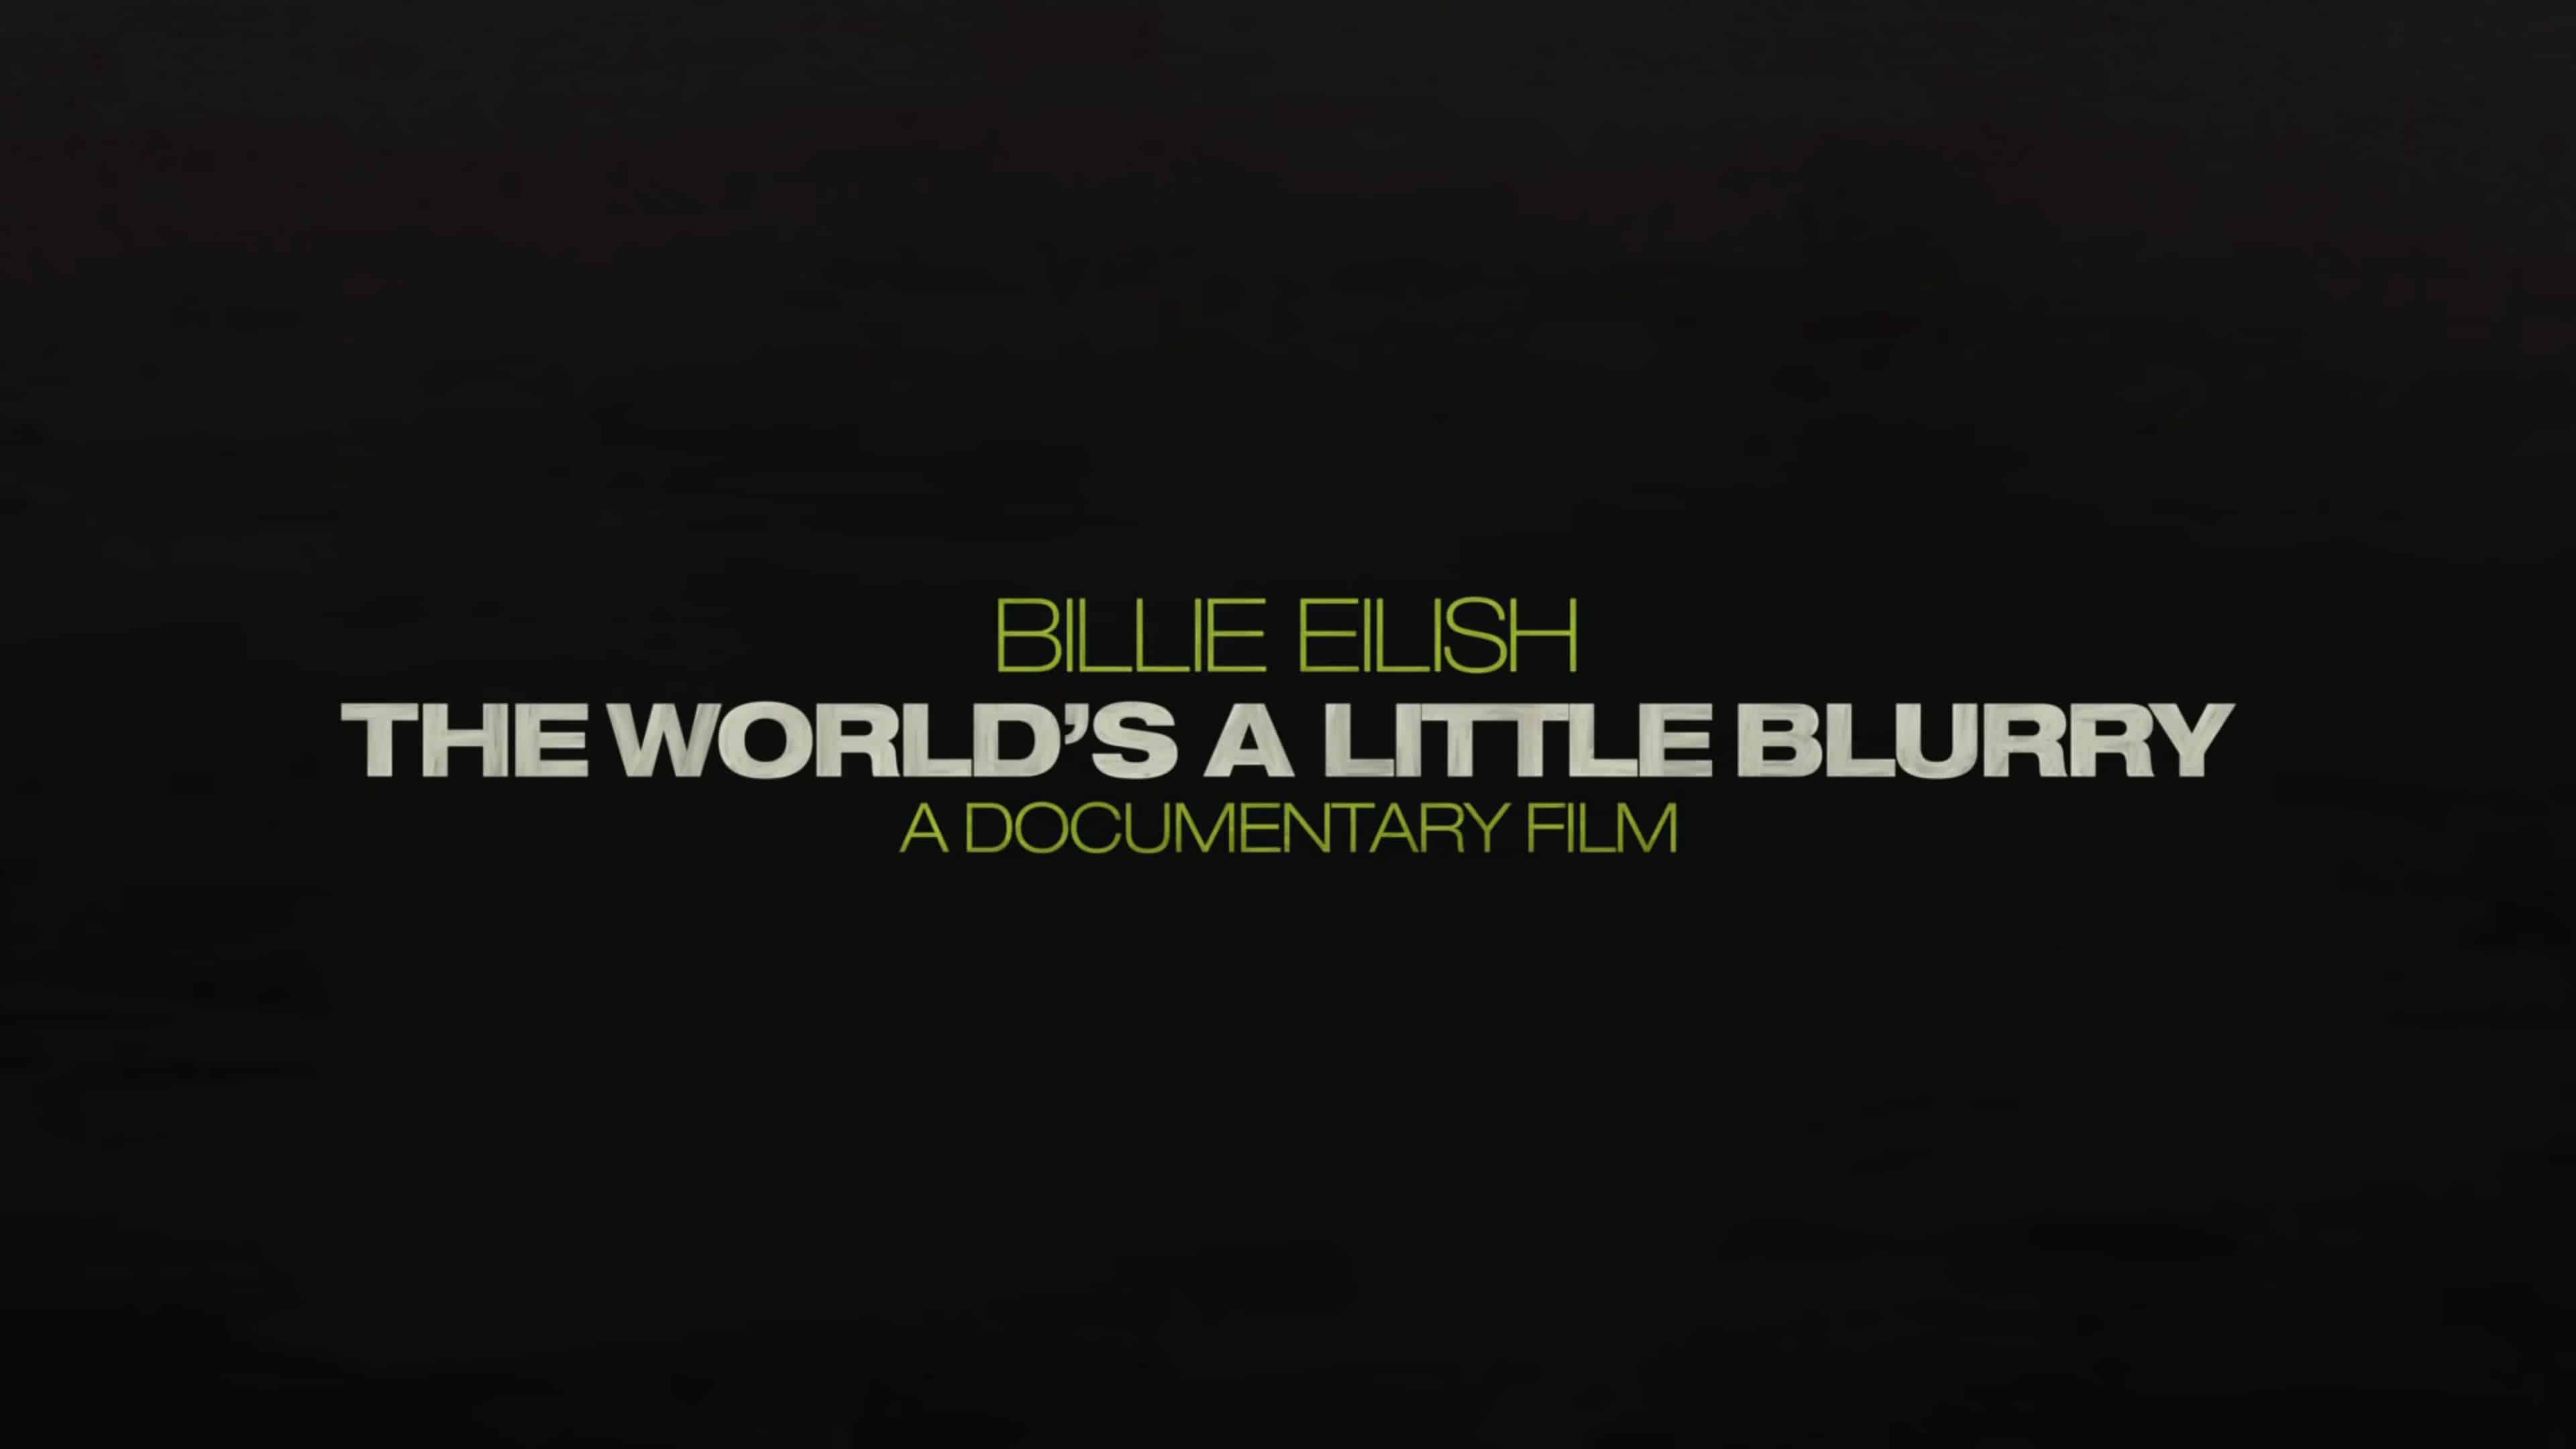 Title Card - Billie Eilish The World's A Little Blurry